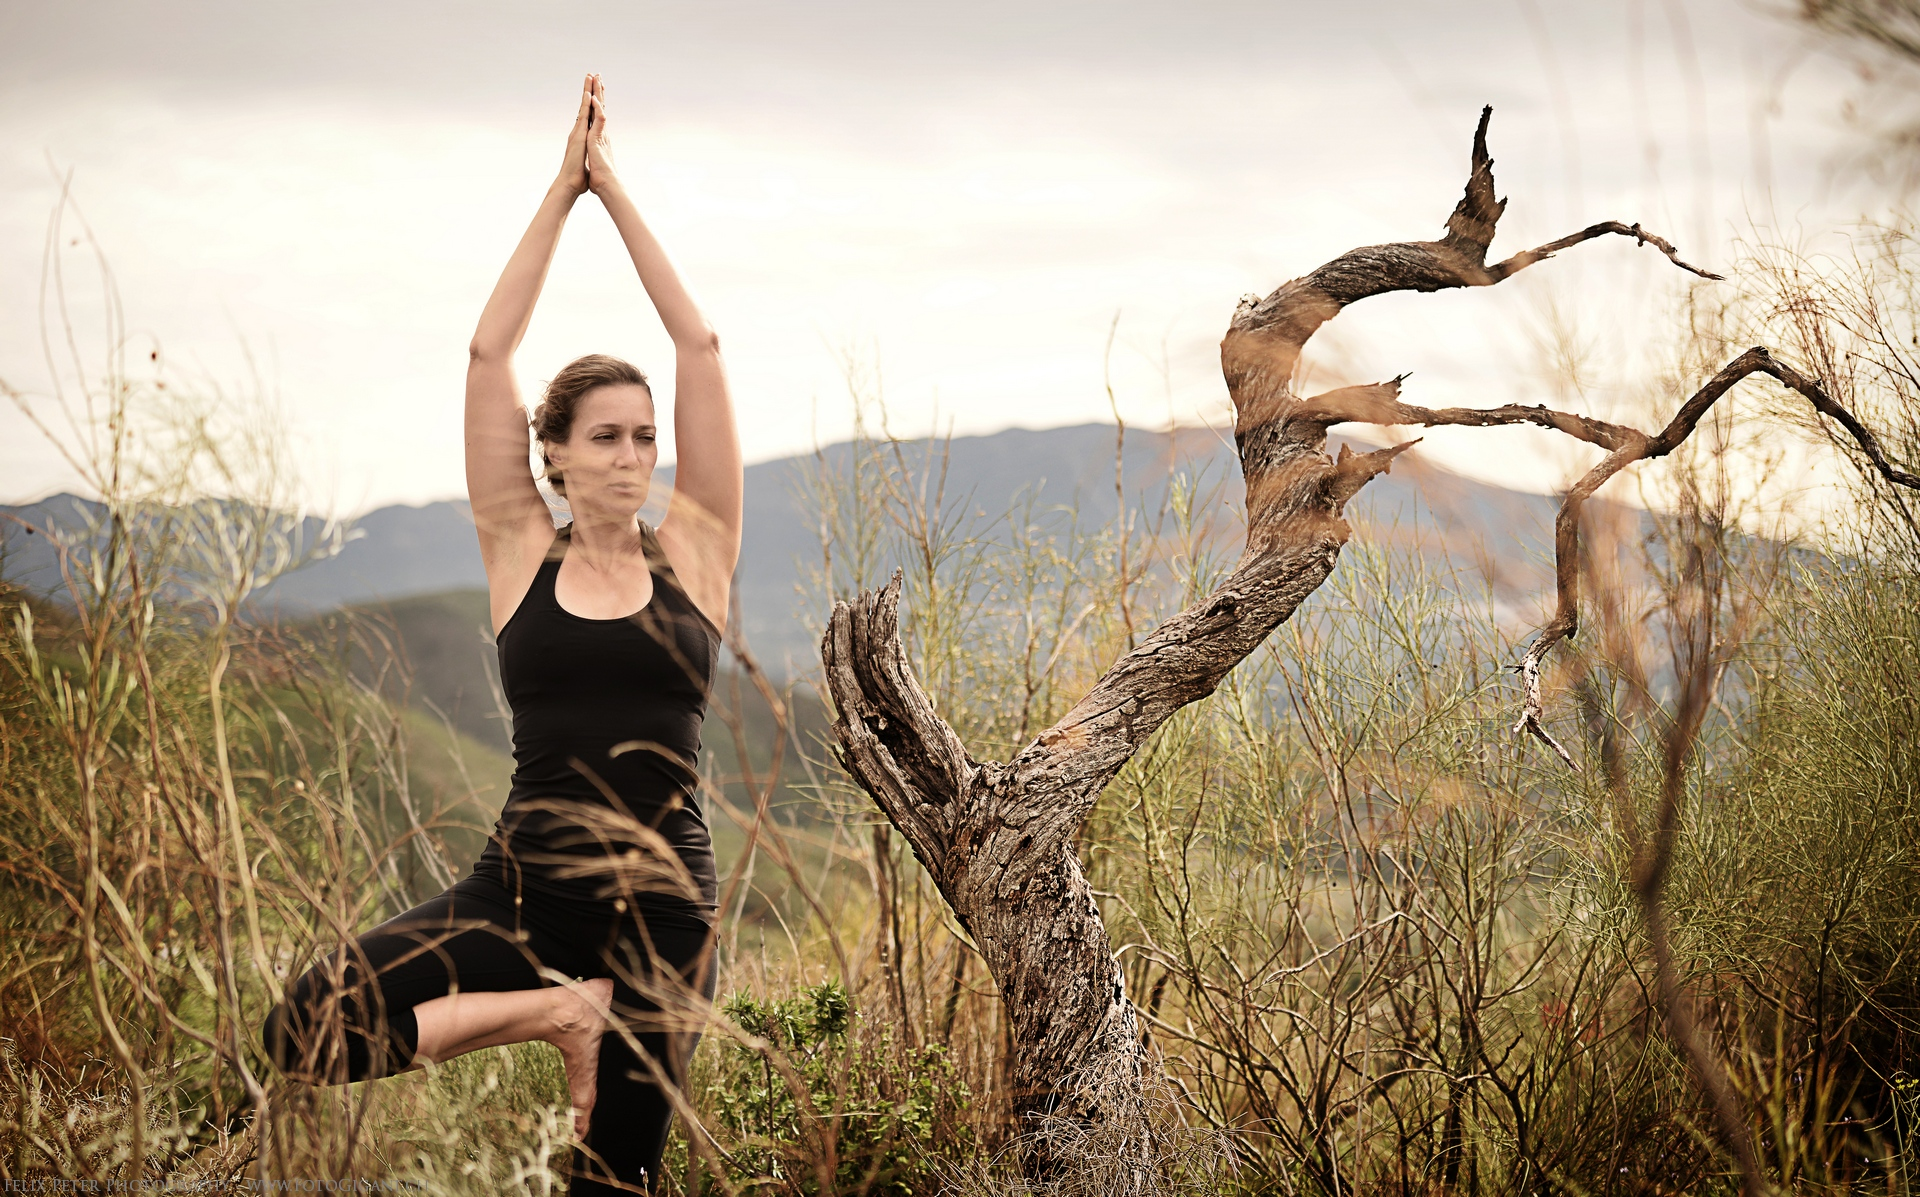 Felix-Peter-Yoga-Pilates-Dance-Fotografie_Bern_068.jpg